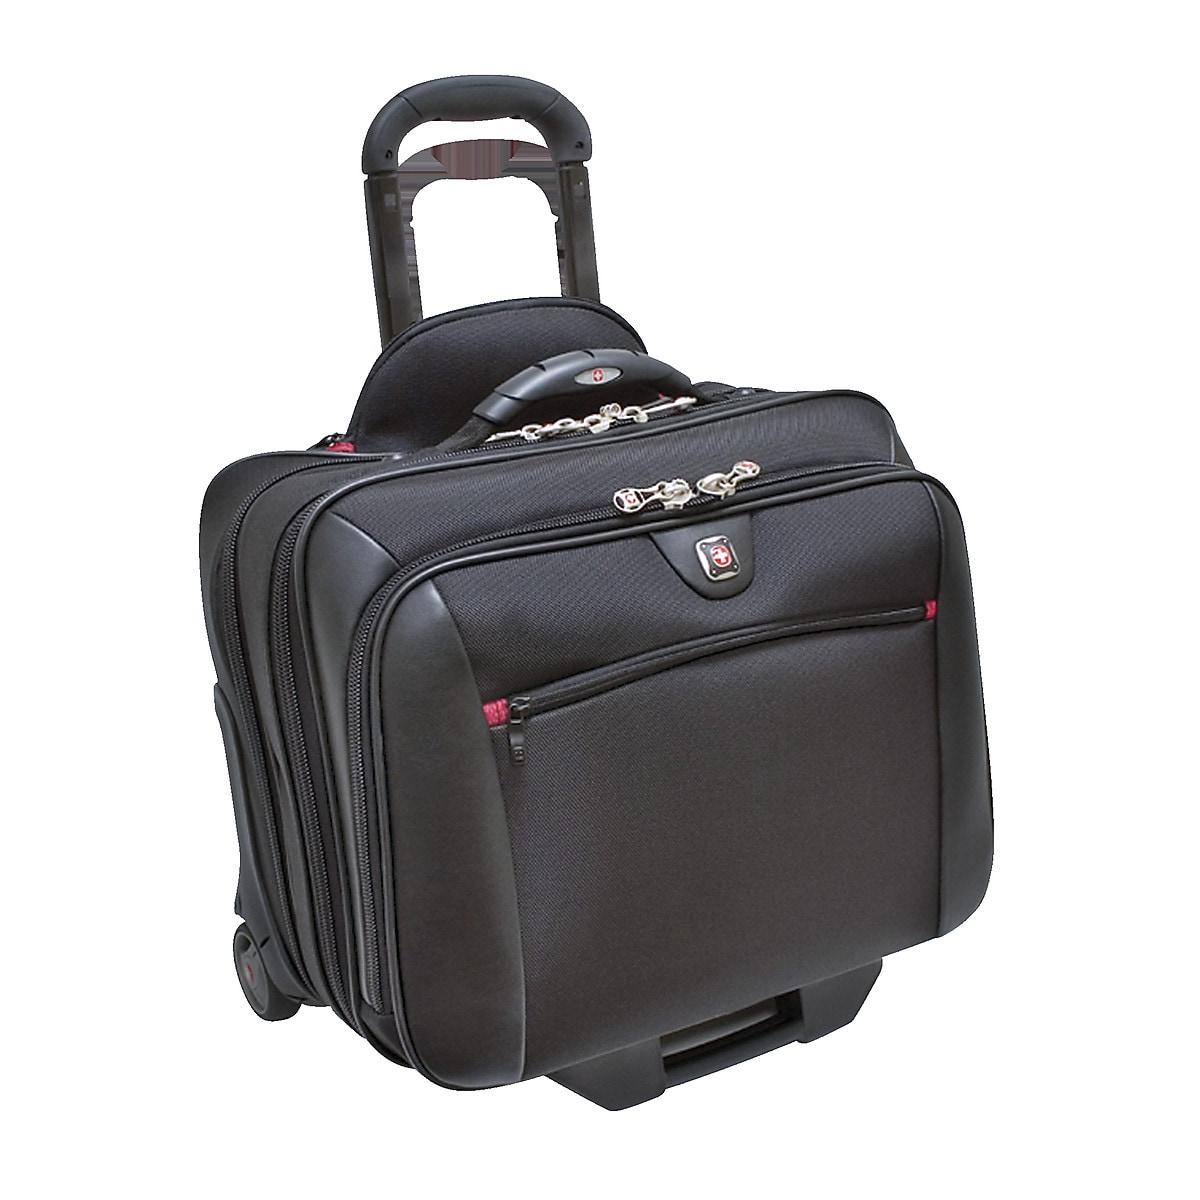 Matkalaukku/laptop-laukku Wenger Potomac